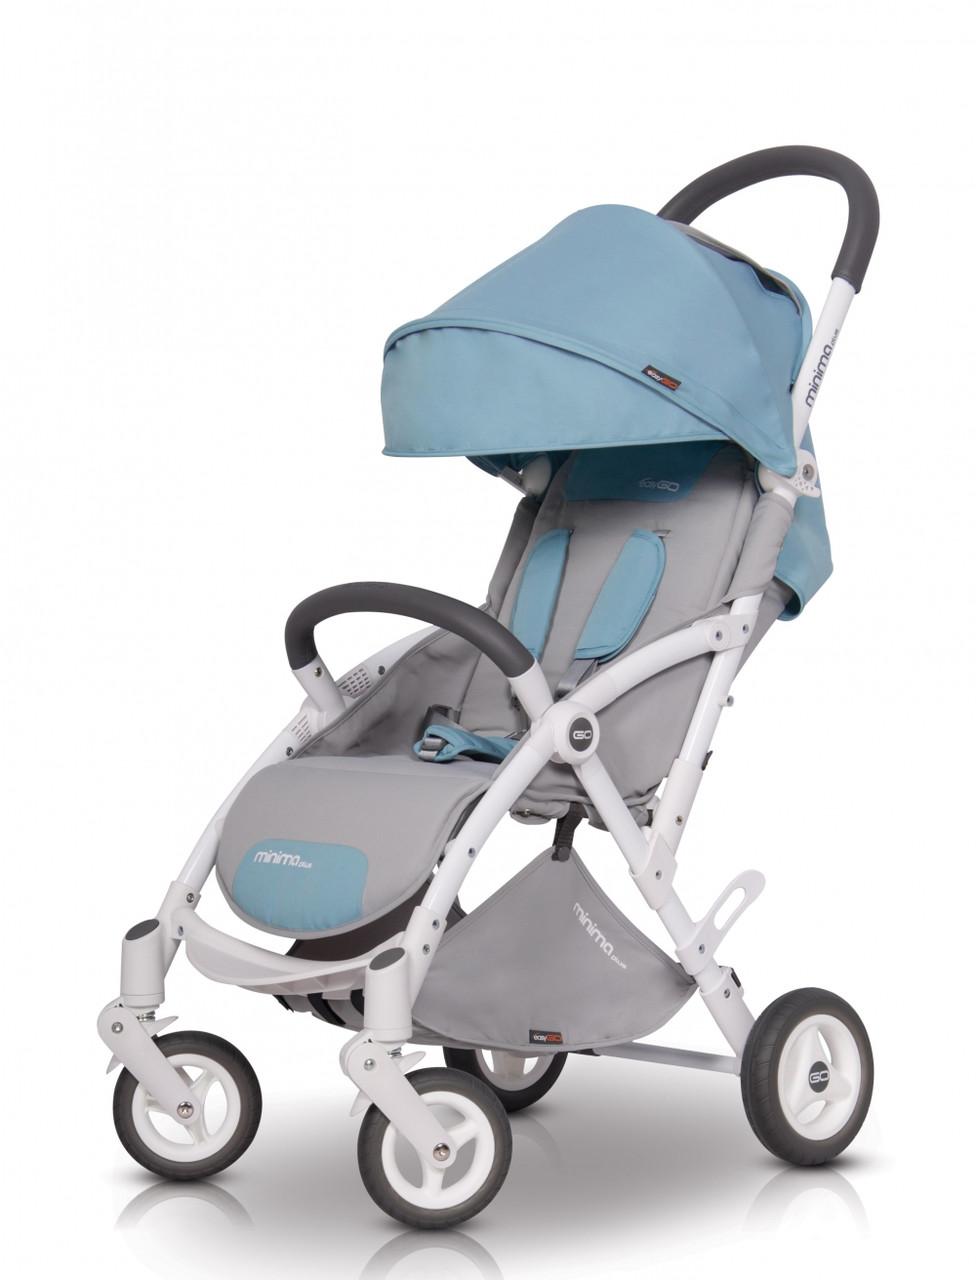 Коляска прогулочная EasyGo Minima Plus niagara голубой (изи гоу минима плас)